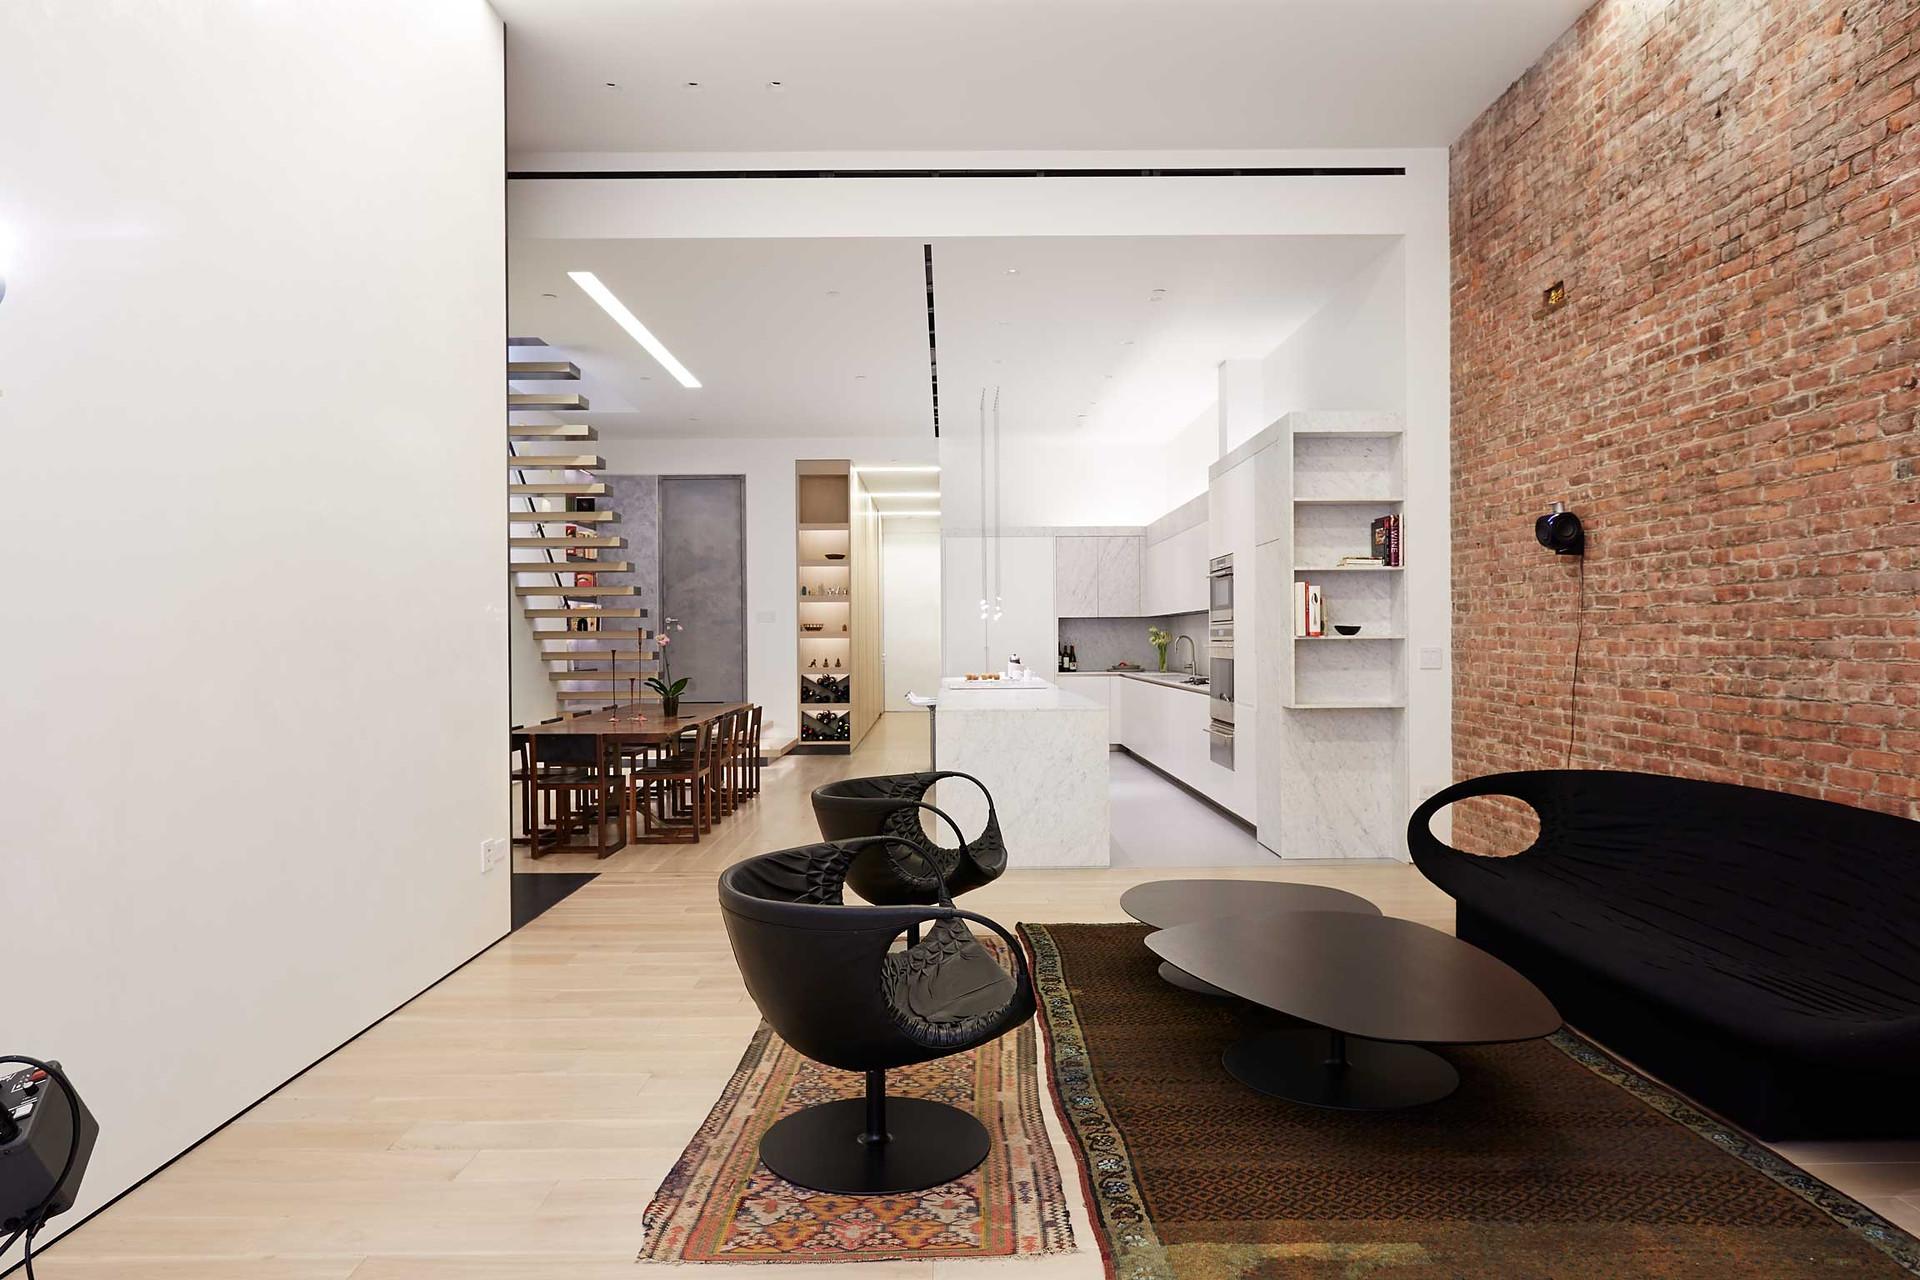 tribeca-penthouse-living-room-1.jpg